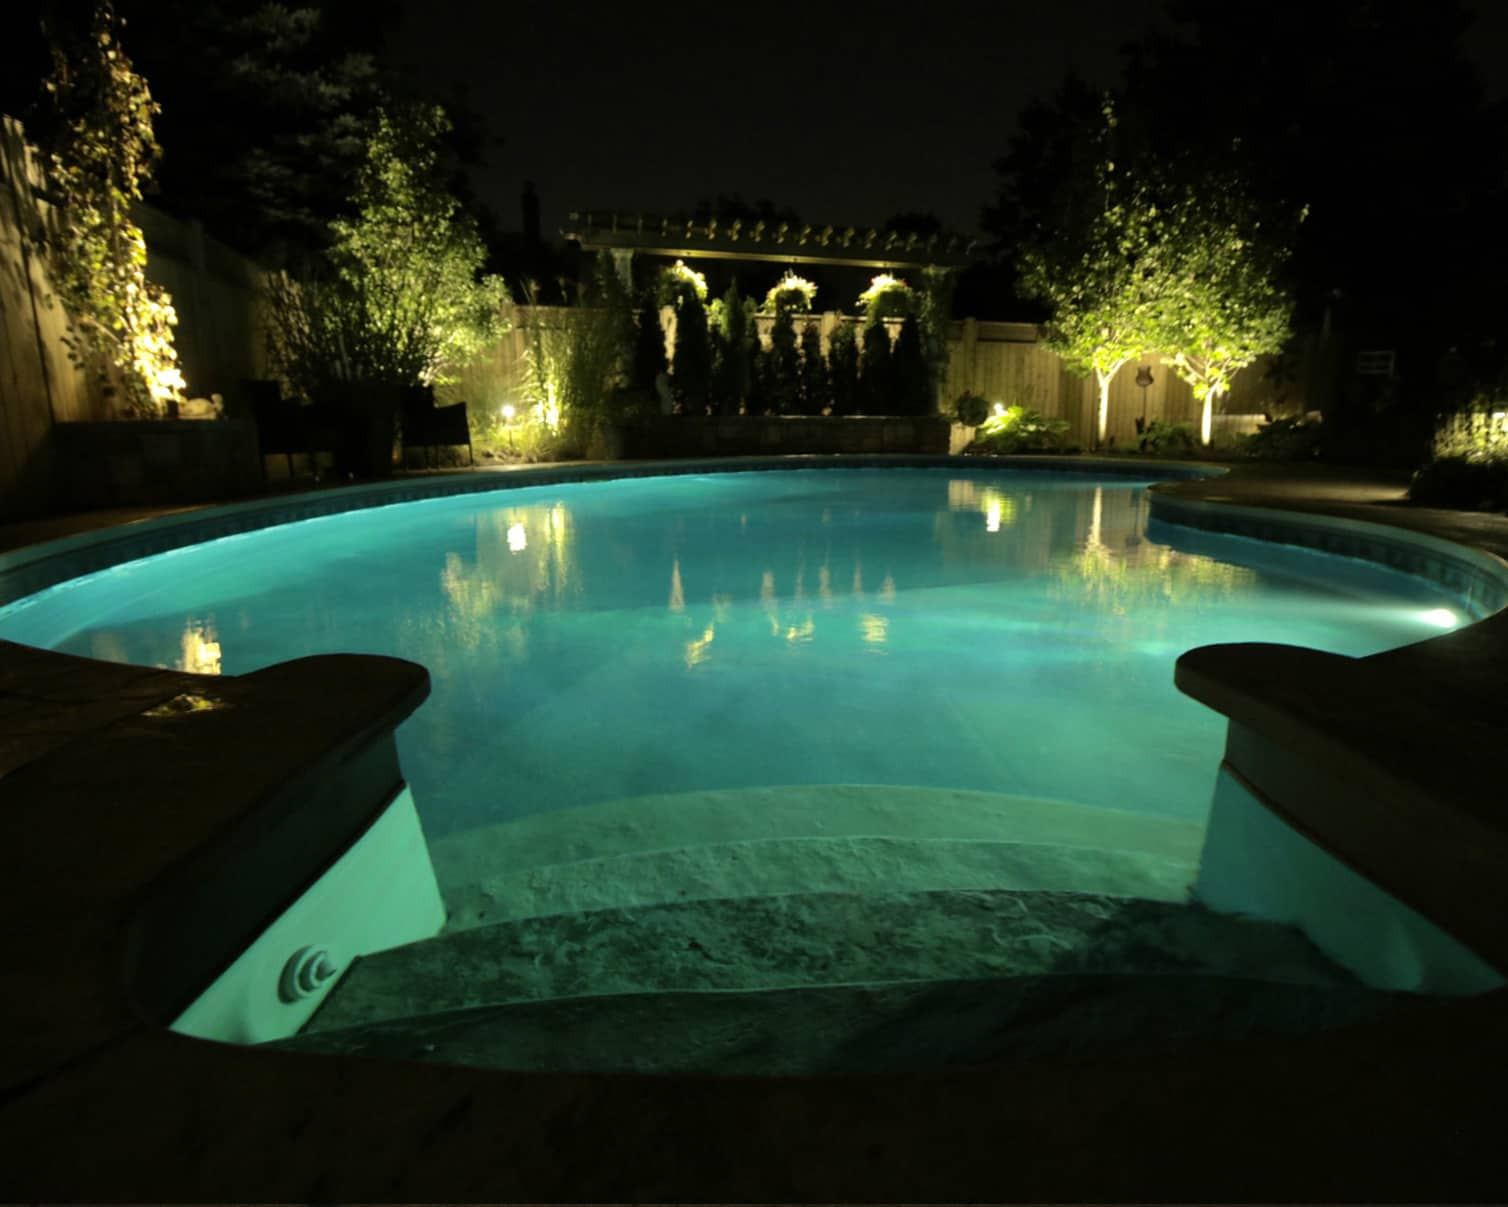 Amoray Retrofit LED Pool Light - Pool Warehouse